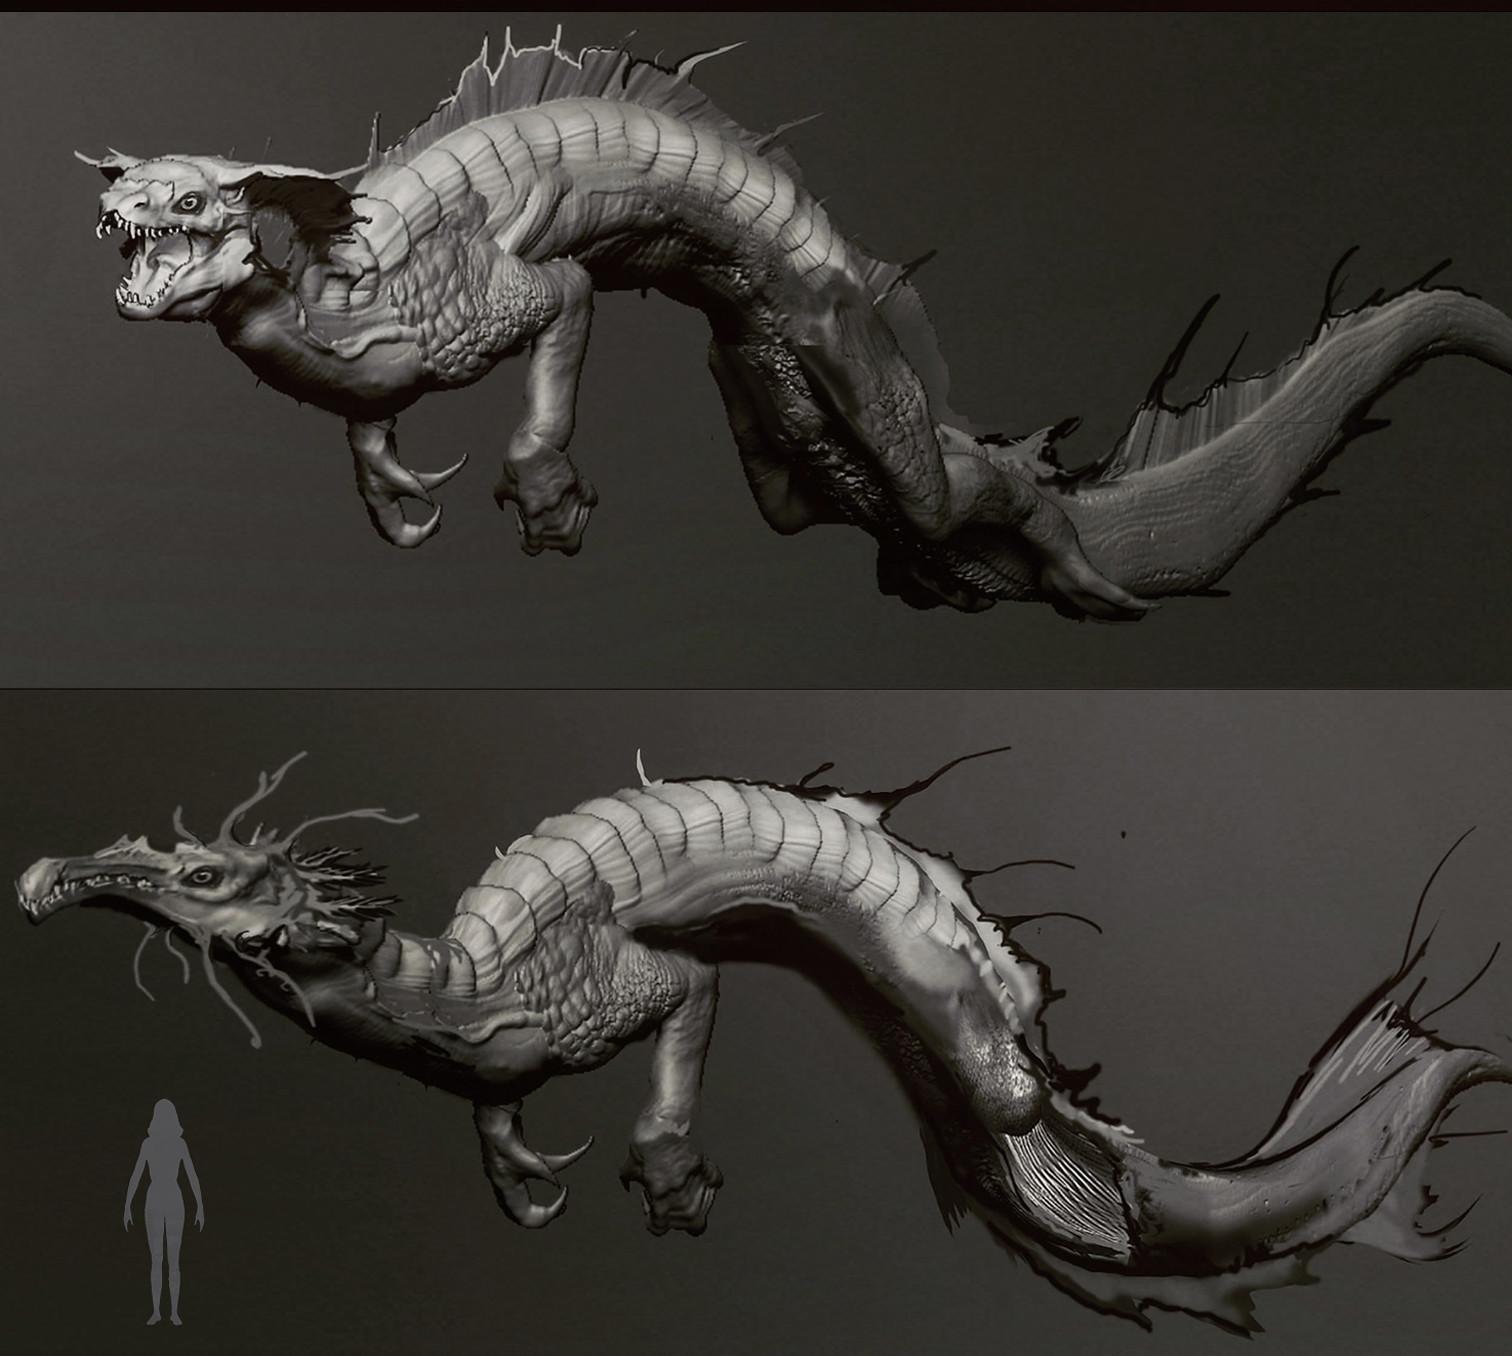 Wietze fopma rough water dragons2